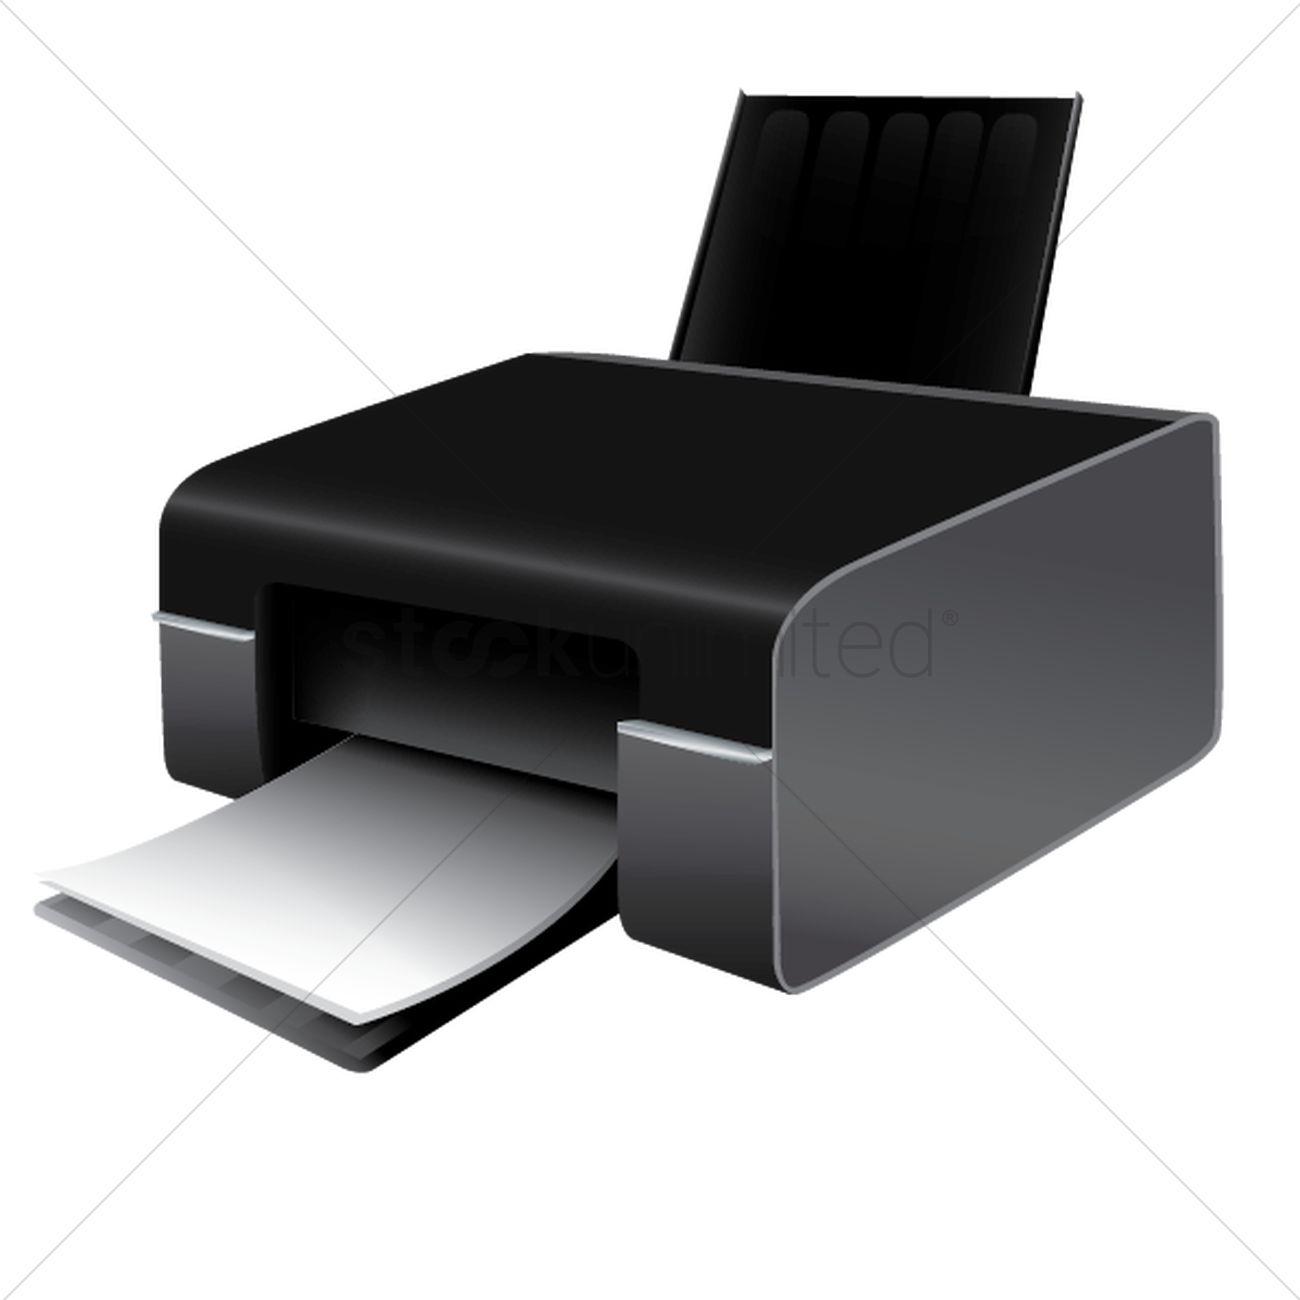 printer vector image 1516232 stockunlimited printer vector image 1516232